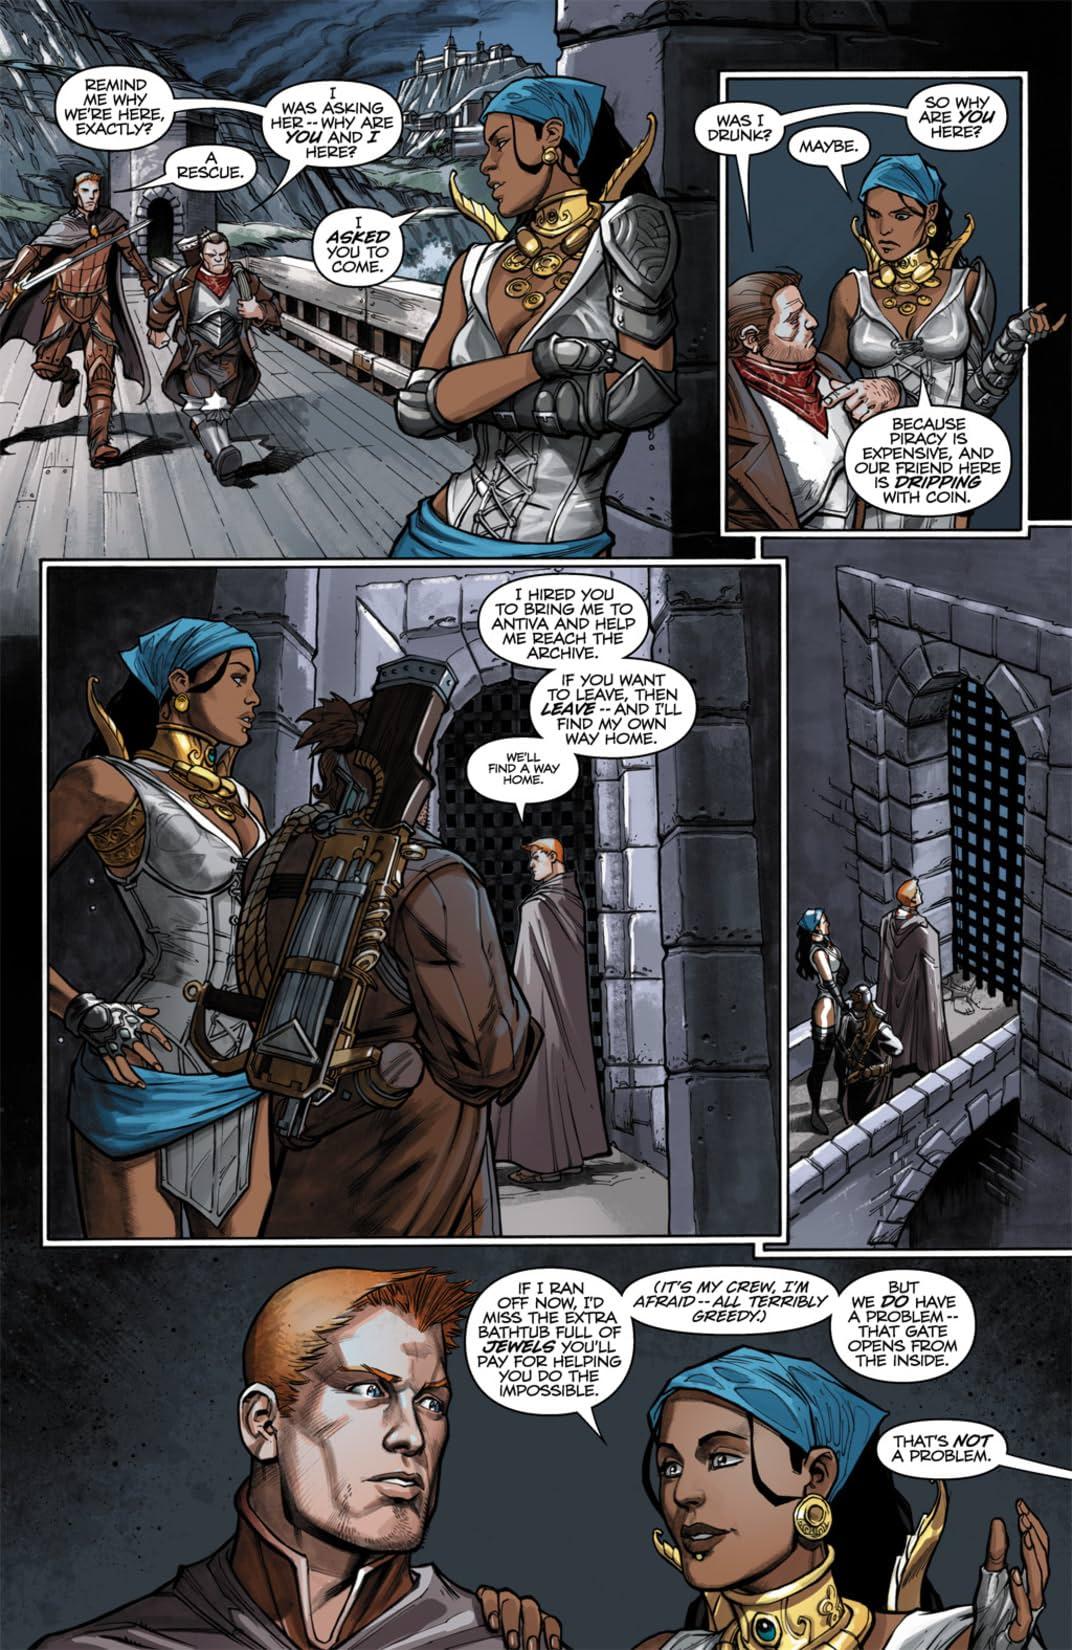 Dragon Age: The Silent Grove #2